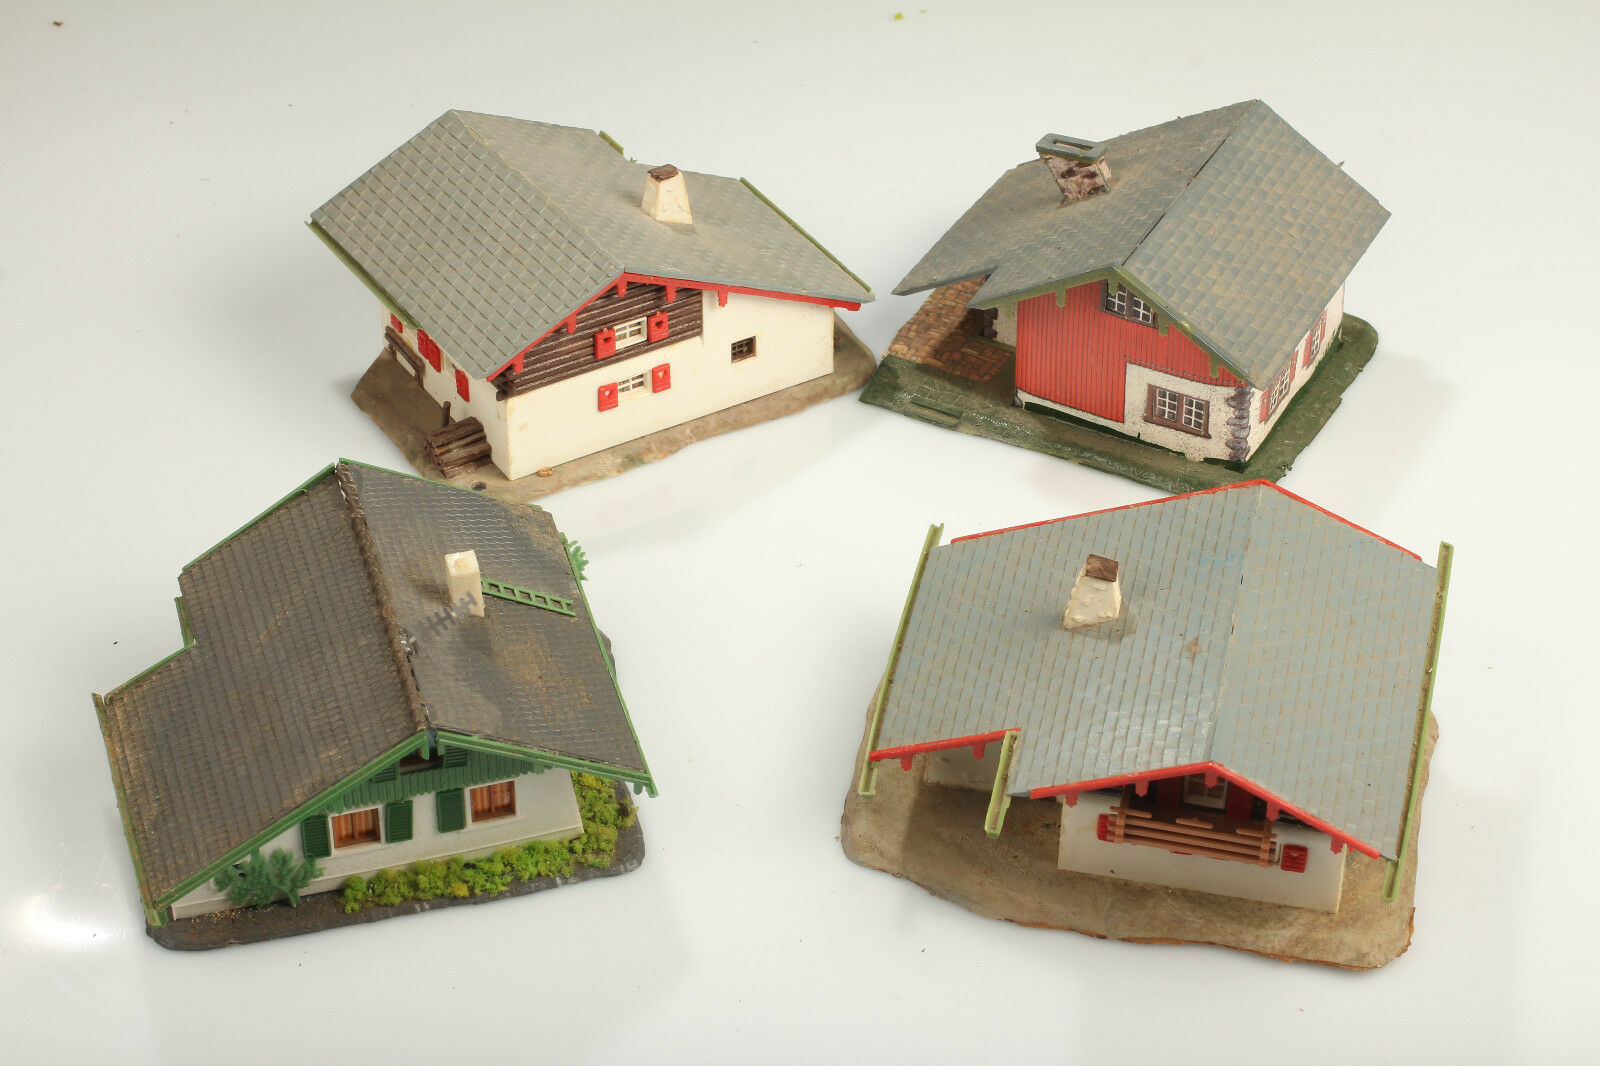 H0 Bundle 4 houses  Live in Bavaria  - Dirt DEFECTS dismantling